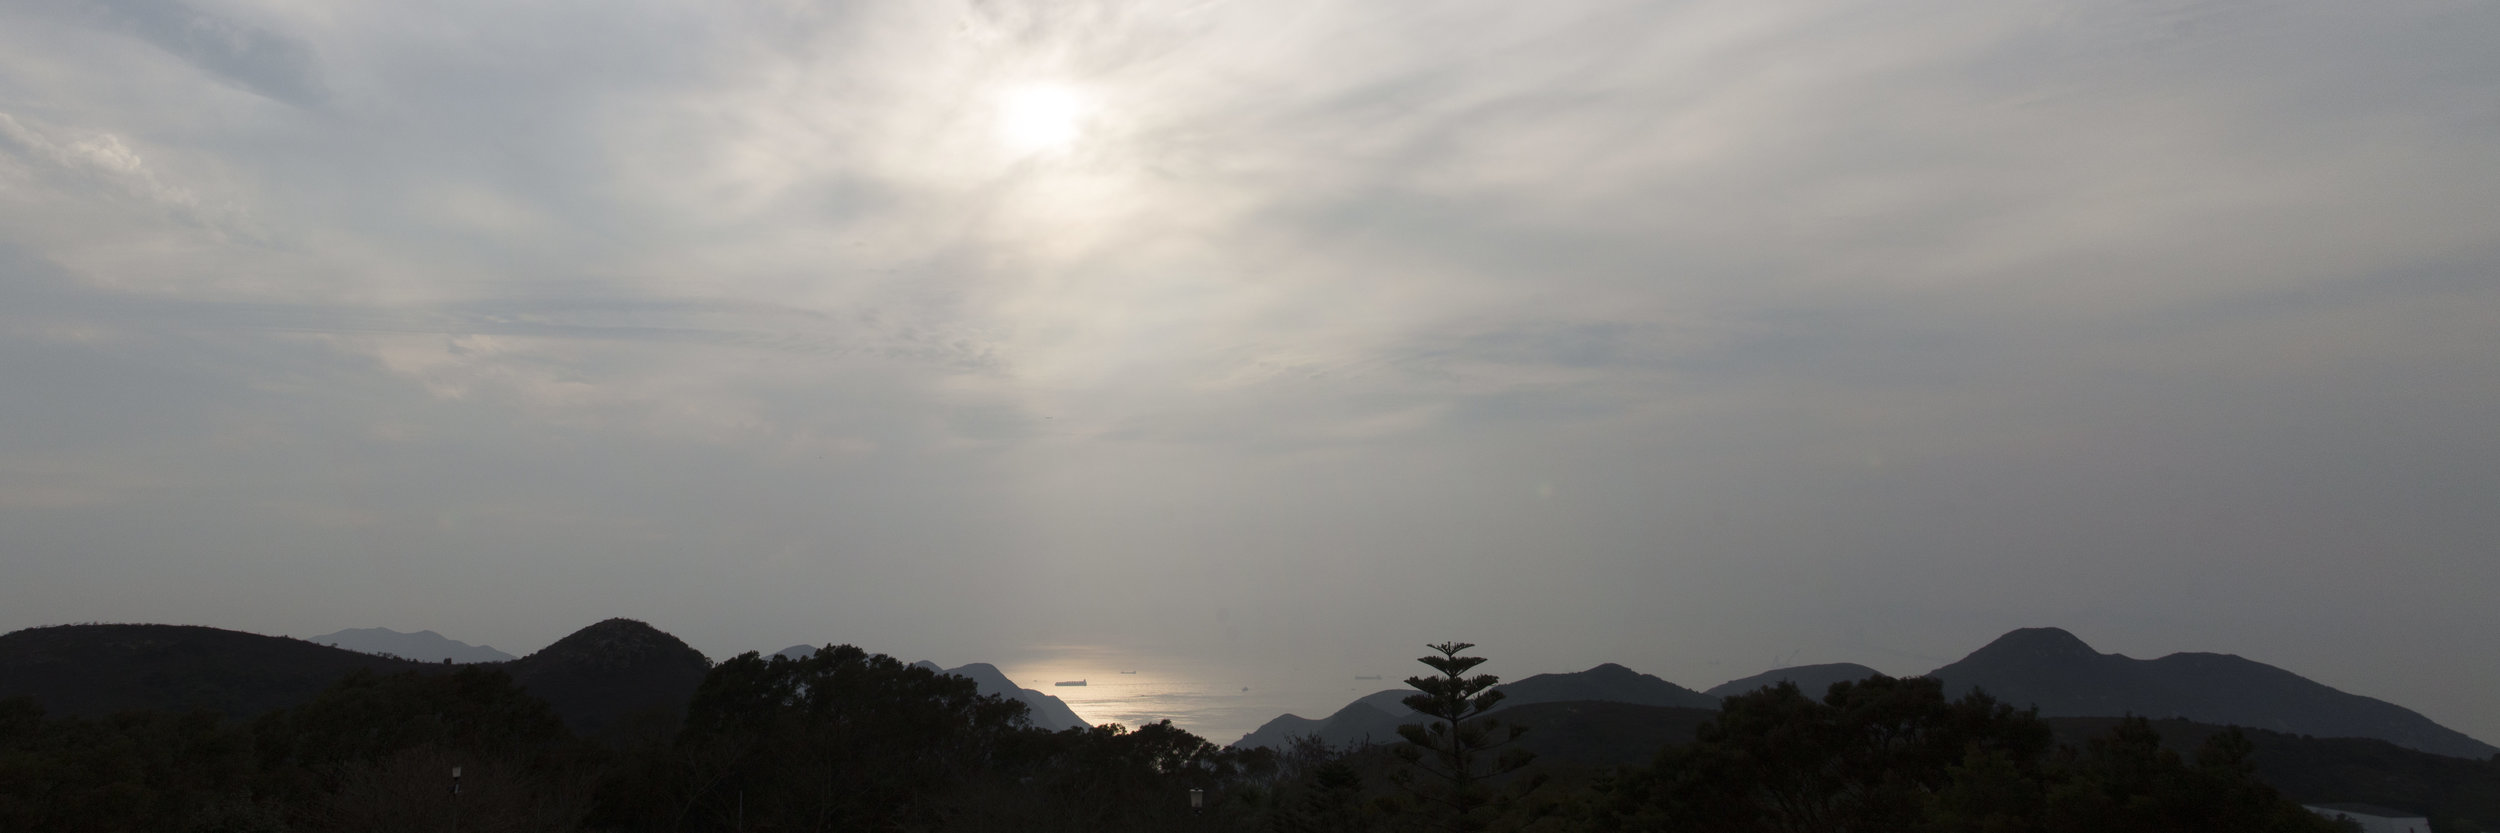 Panorama1_Hong_Kong_2016 copy.jpg